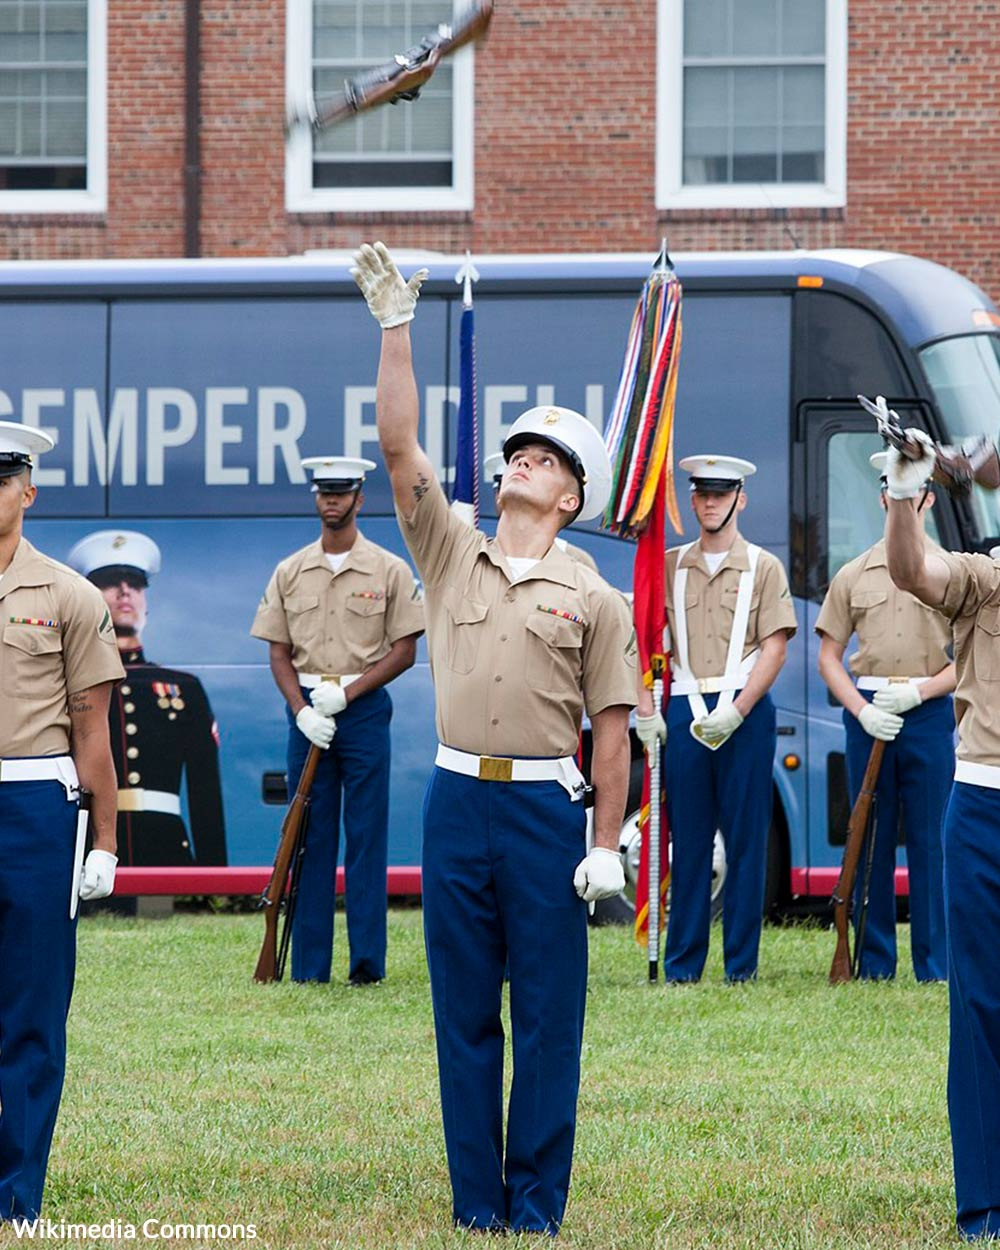 The United States Marine Corps Silent Drill Platoon performs at the United States Marine Corps Enlisted Awards Parade and Presentation held at Marine Corps Base Quantico, Va.